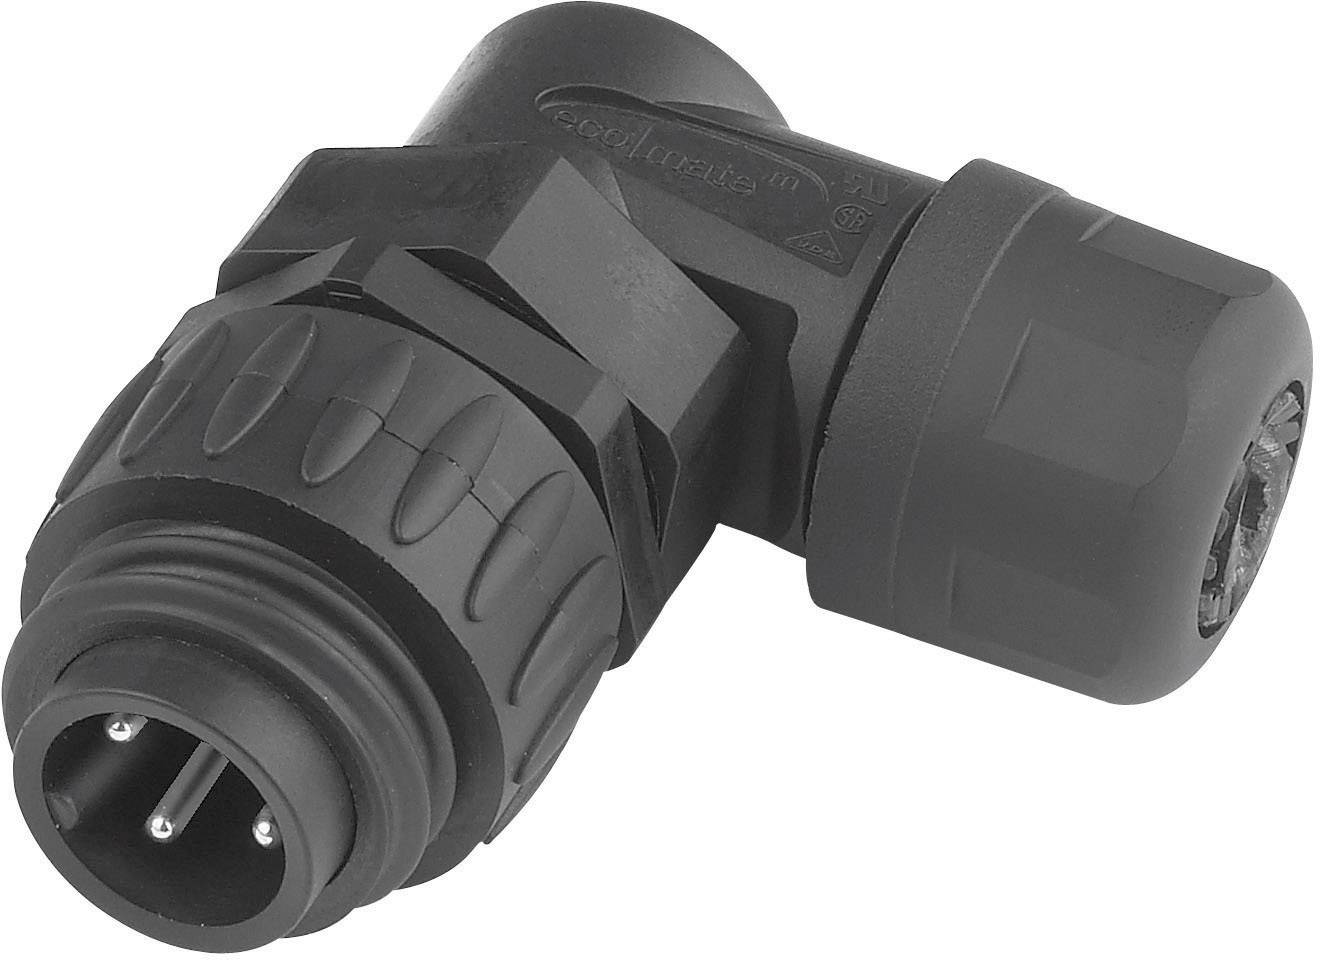 Kabelový konektor 6+PE Amphenol C016 10K006 000 12, černá, úhlový